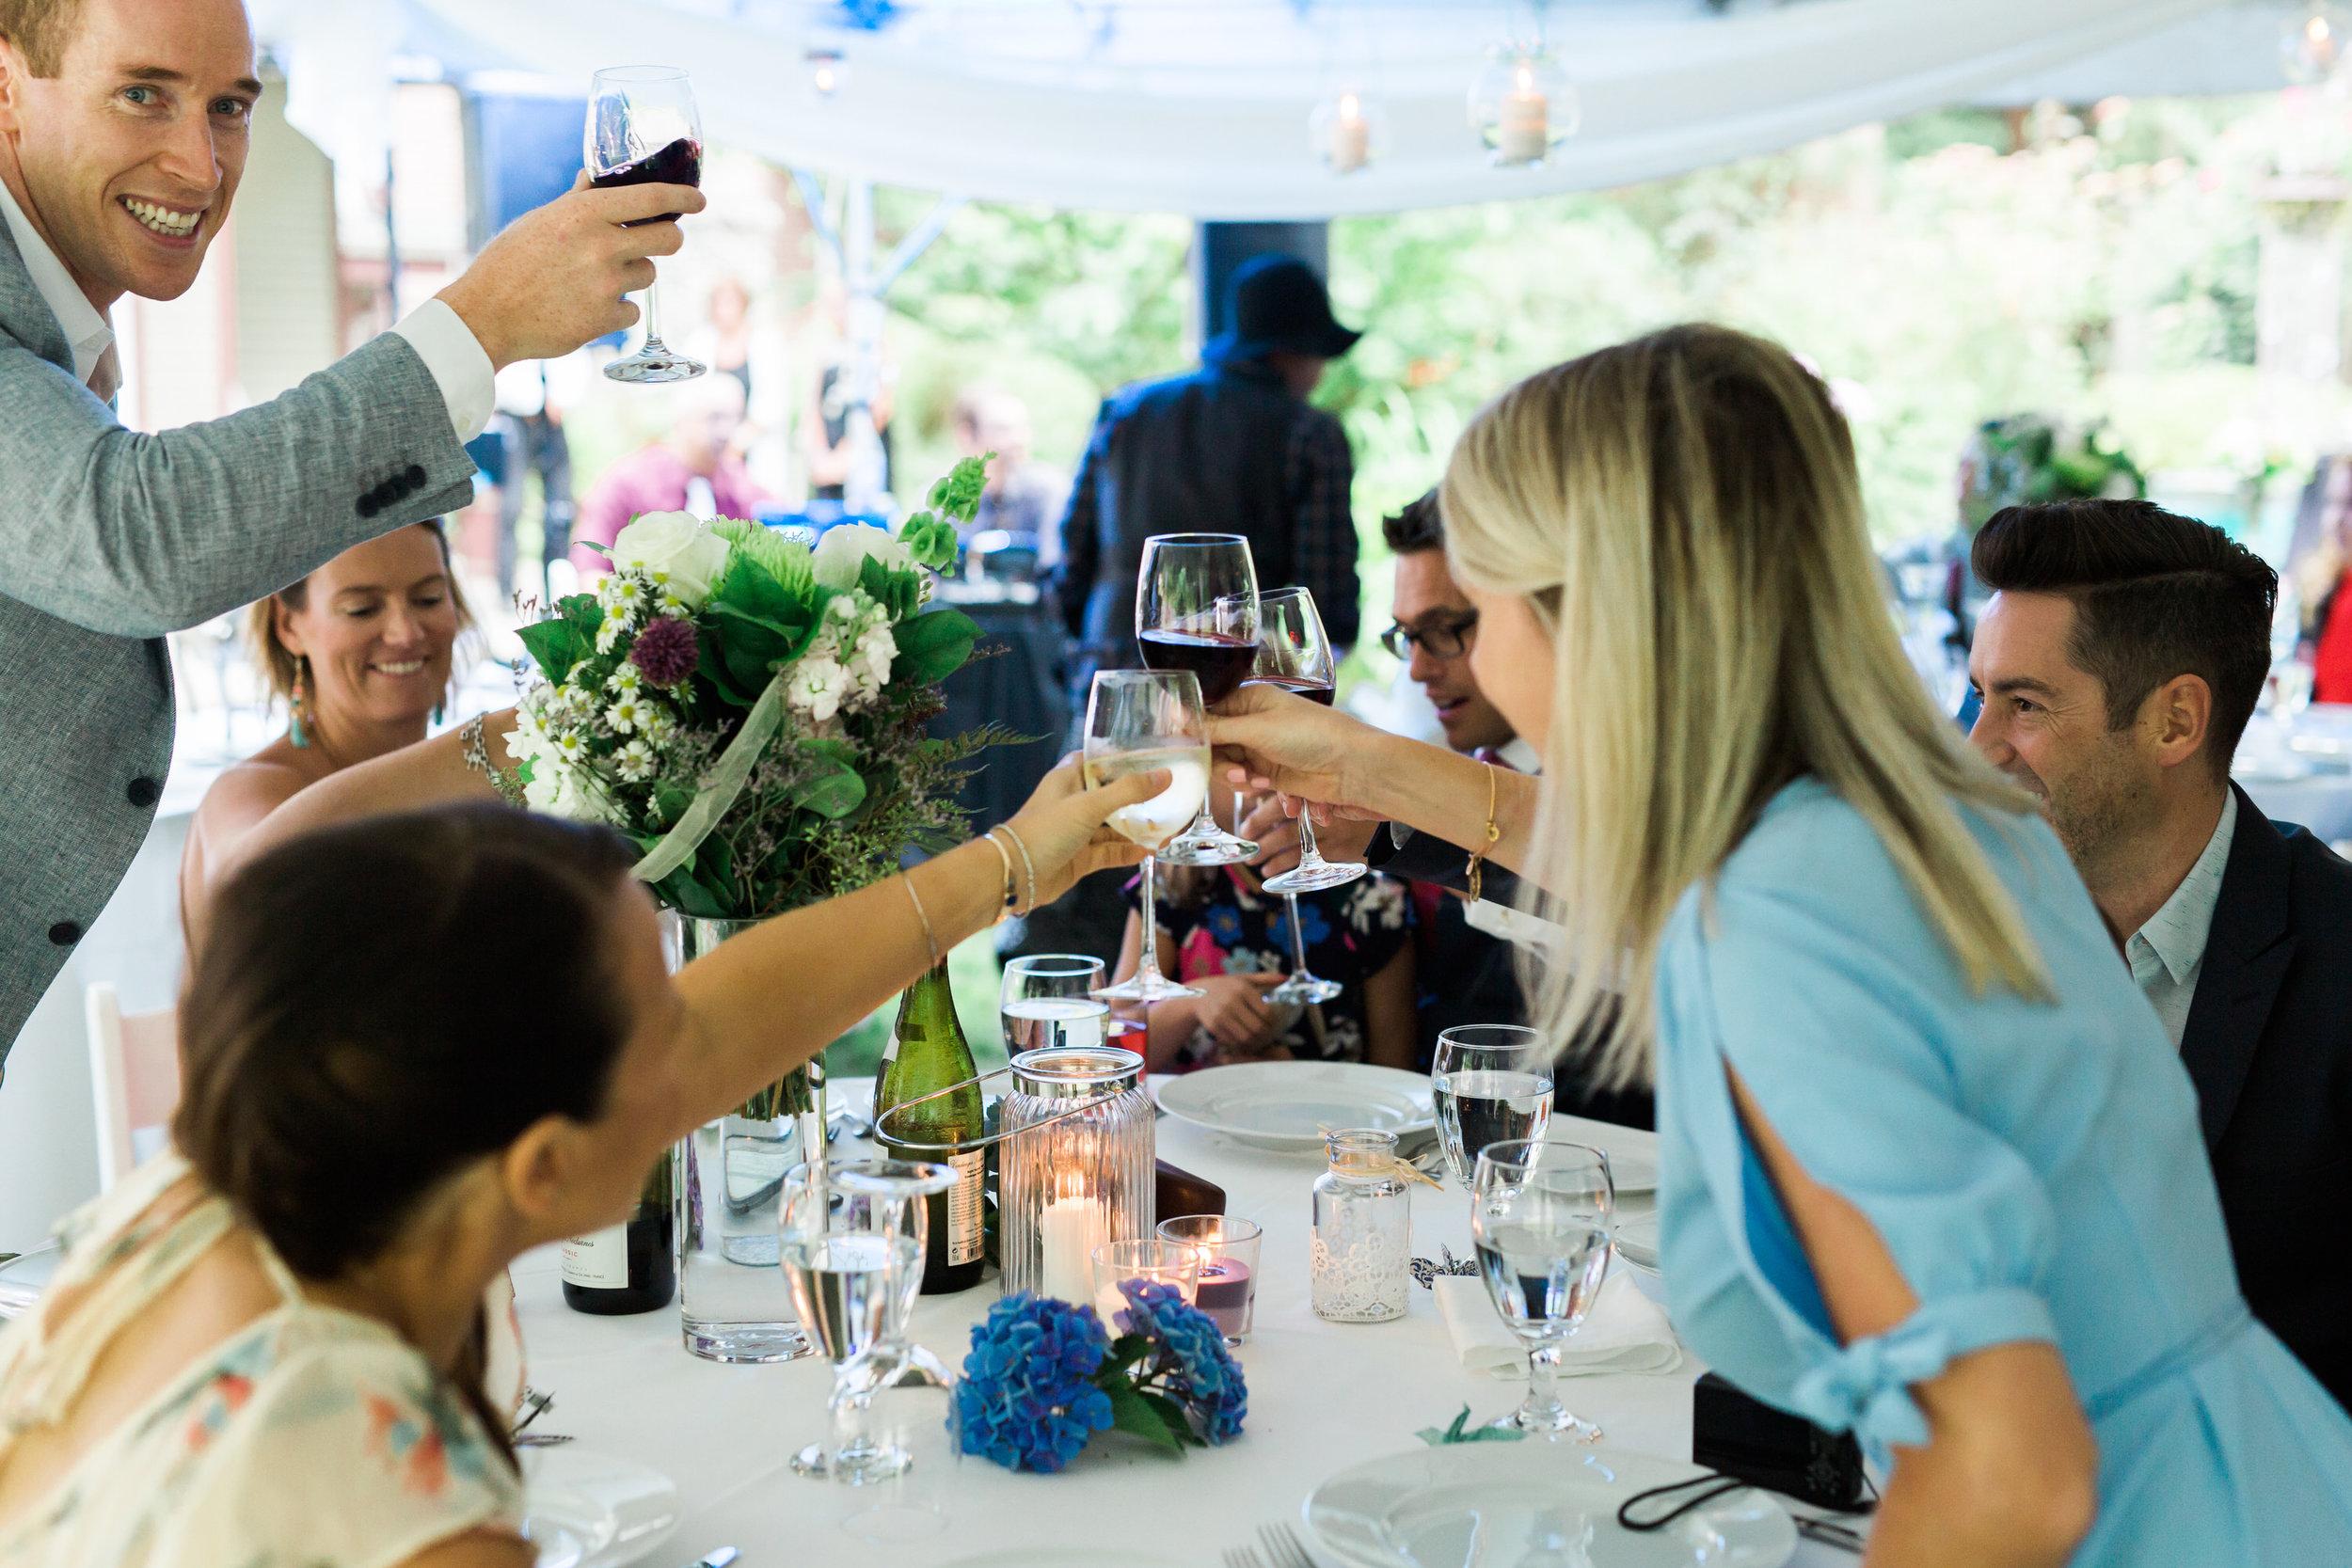 Linwood House Wedding Photos - Roberts Creek Wedding Photos - Vancouver Wedding Photographer & Videographer - Sunshine Coast Wedding Photos - Sunshine Coast Wedding Photographer - Jennifer Picard Photography - IMG_8678.jpg